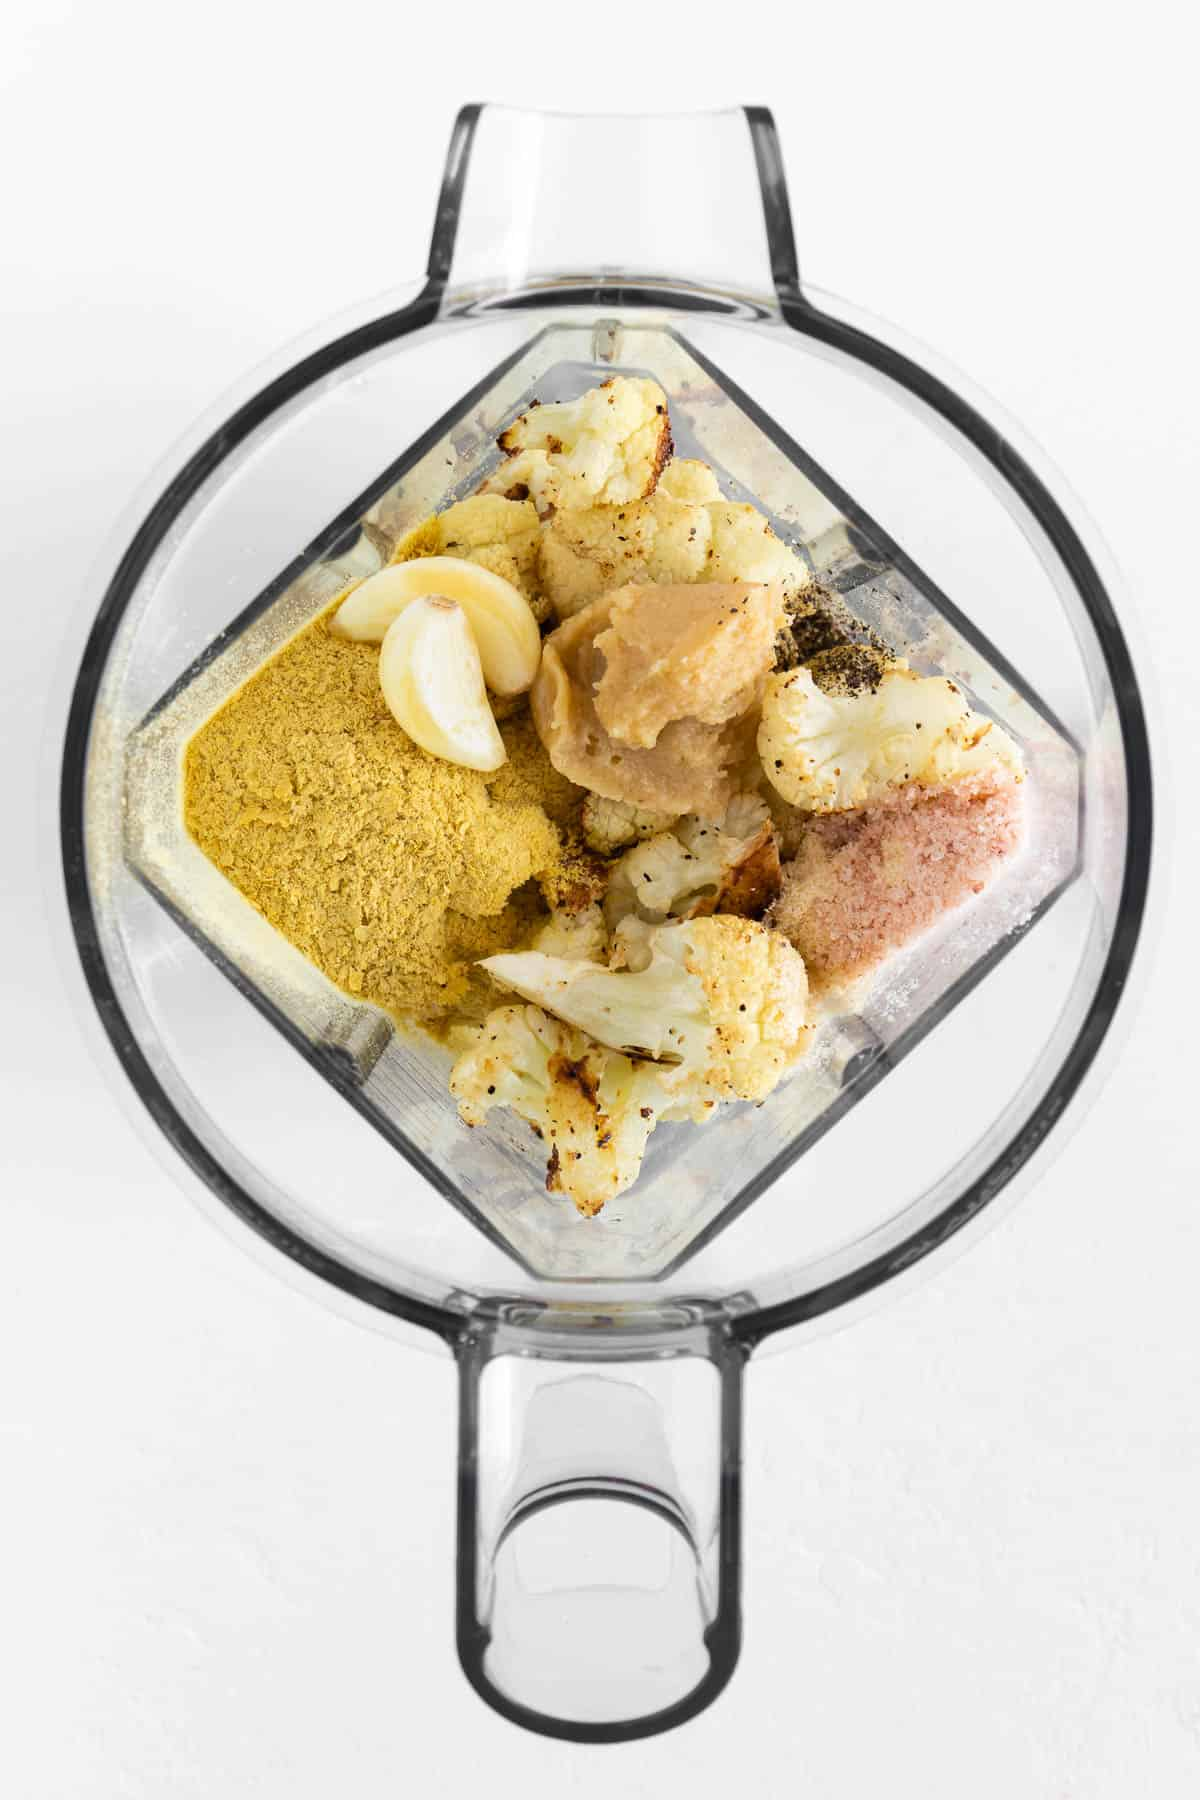 cauliflower, nutritional yeast, garlic cloves, salt, and mellow white miso paste inside a blender